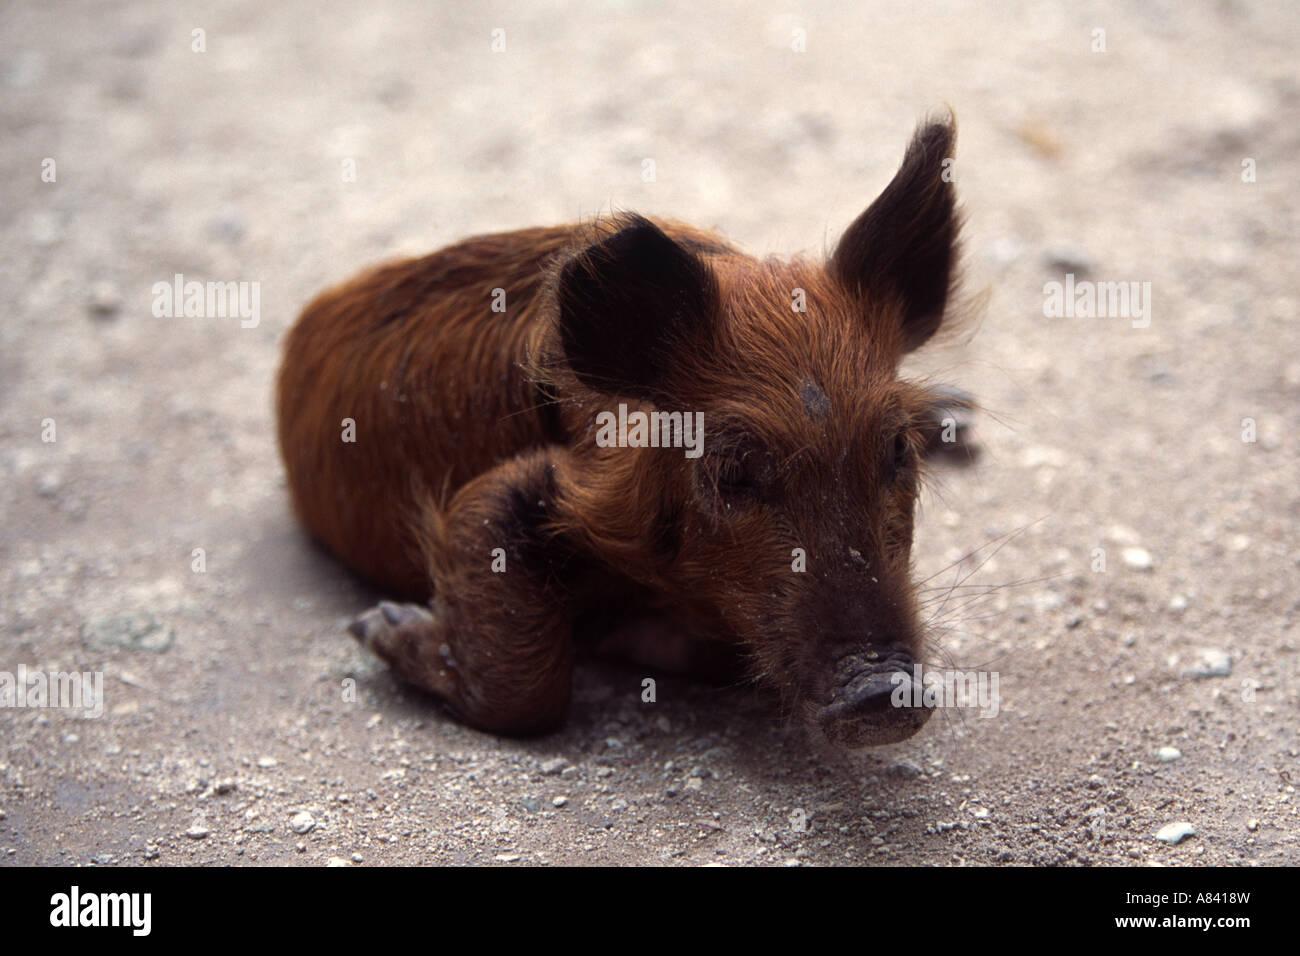 A Piglet on the Island of Tarawa, Kiribati South Pacific - Stock Image